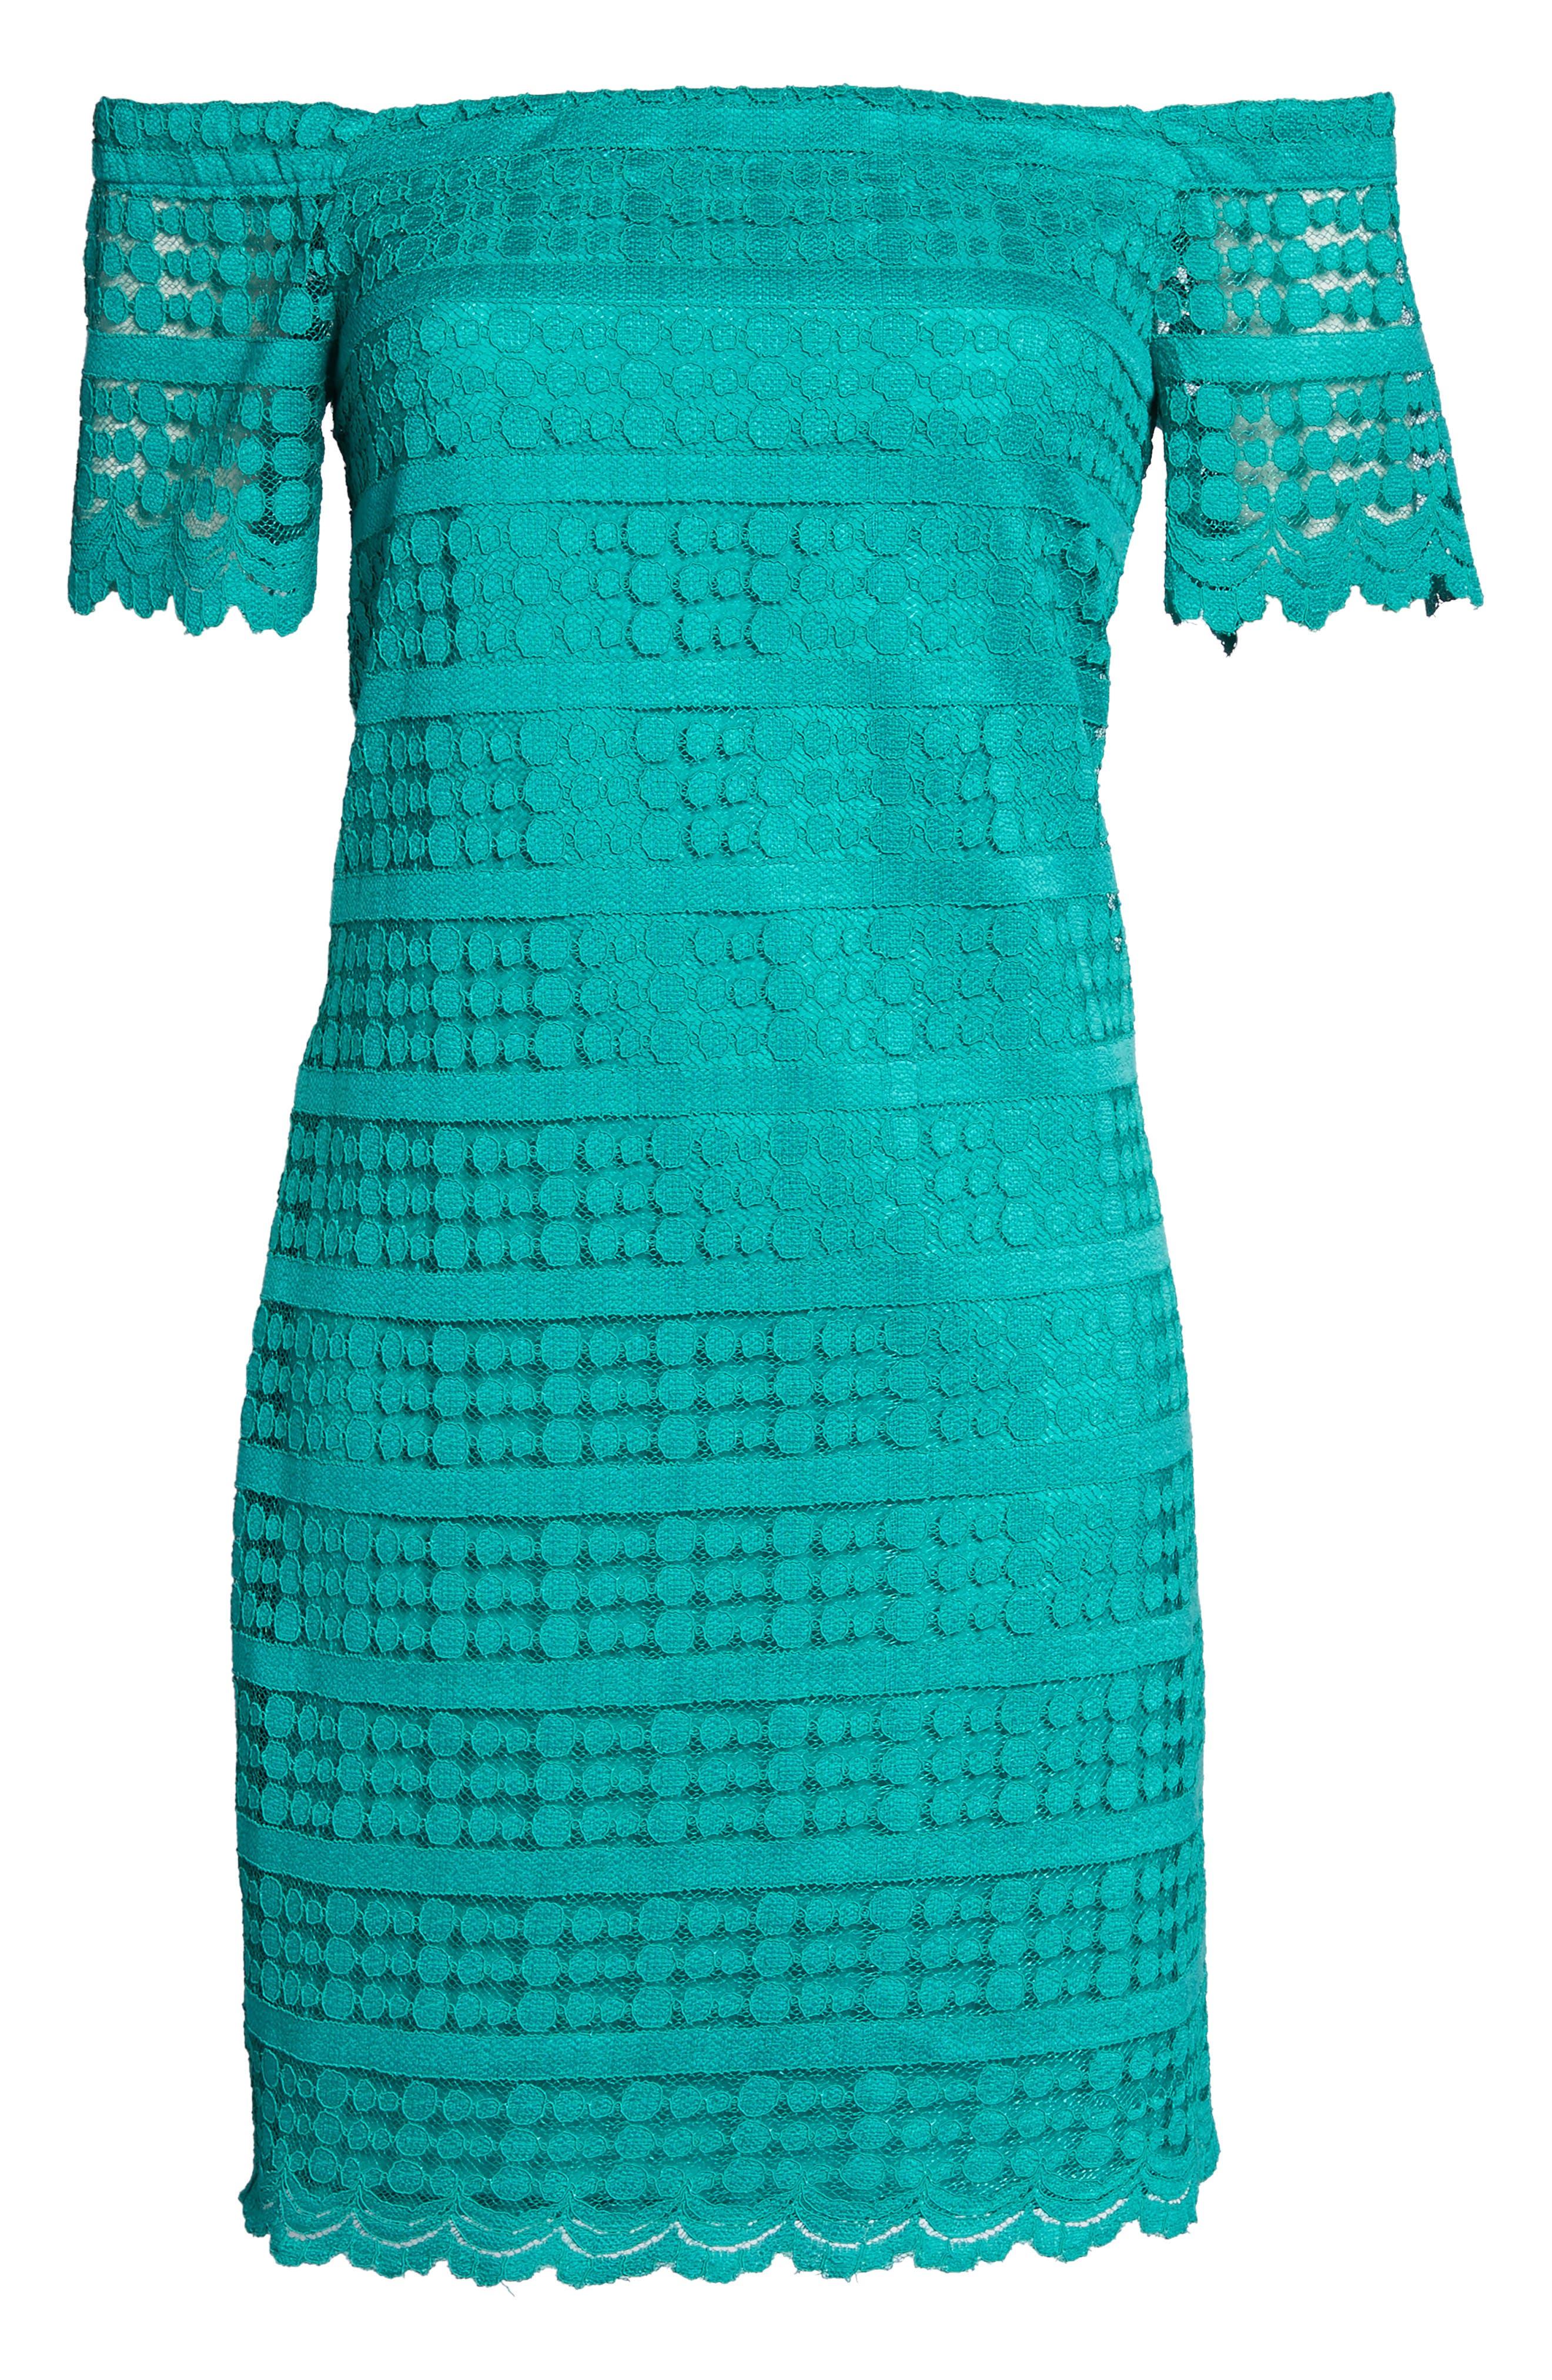 Merengue Off the Shoulder Minidress,                             Alternate thumbnail 12, color,